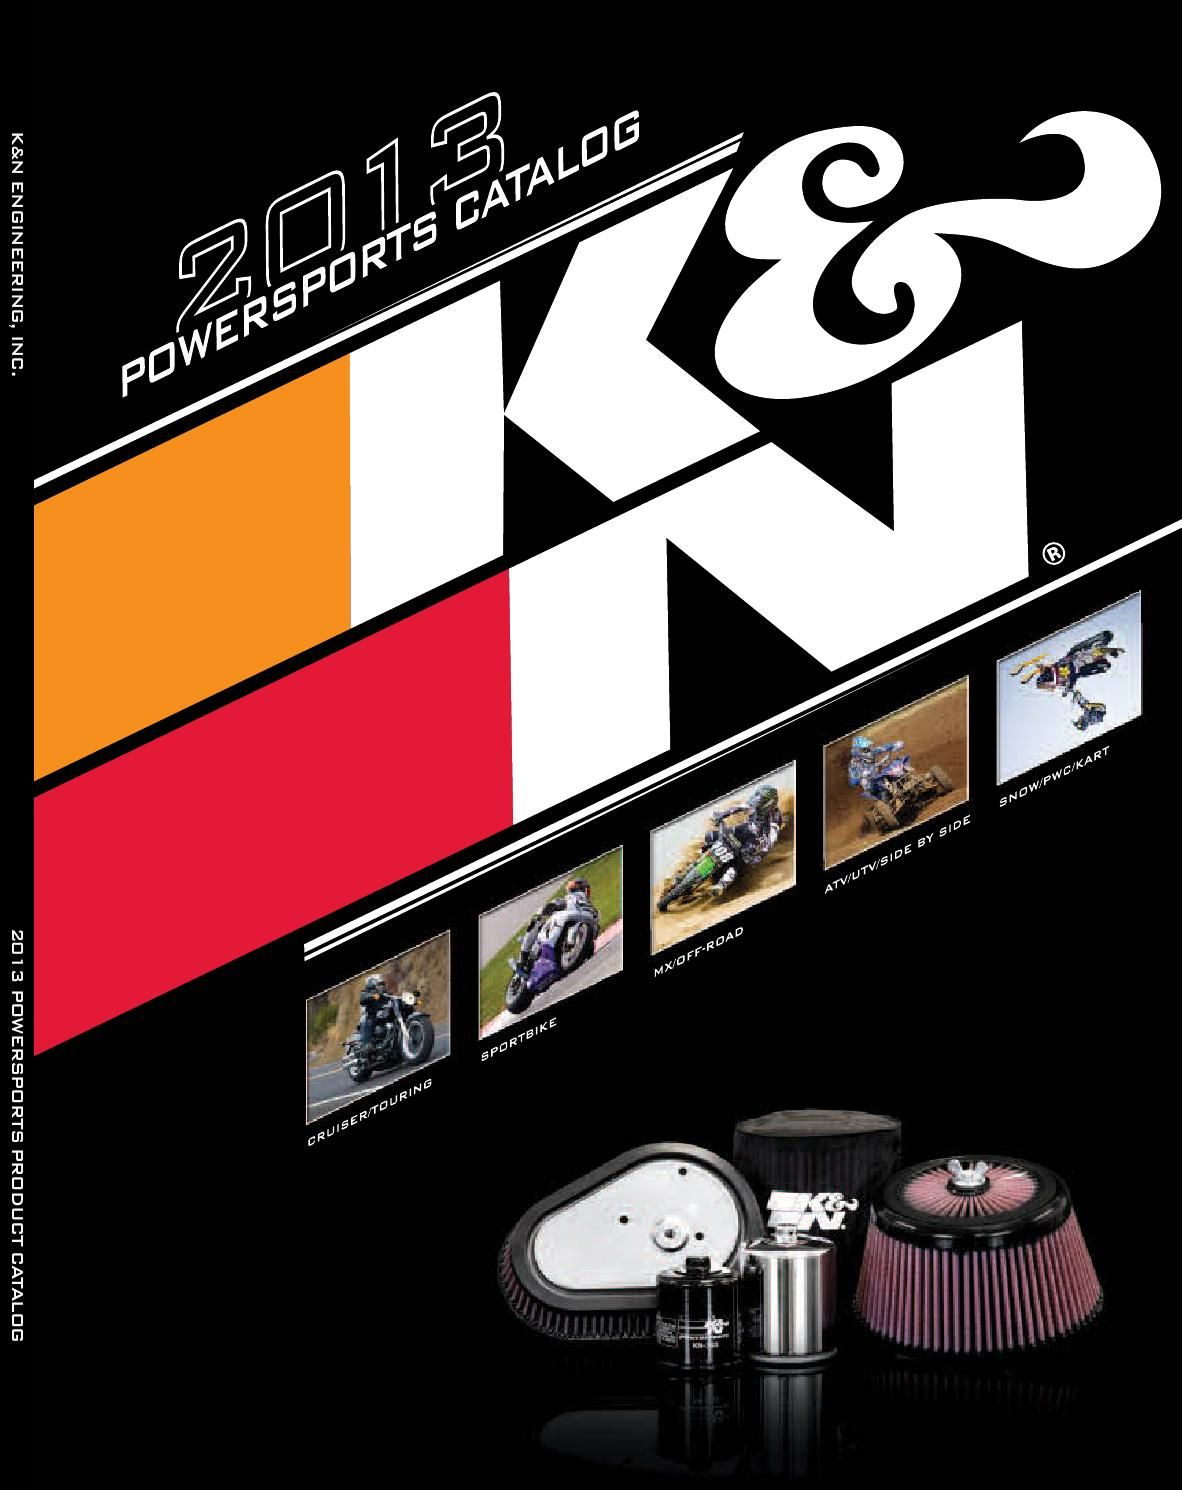 K&N Air Filters Catalogo 2013 Atv, Motorcycle, Catalog